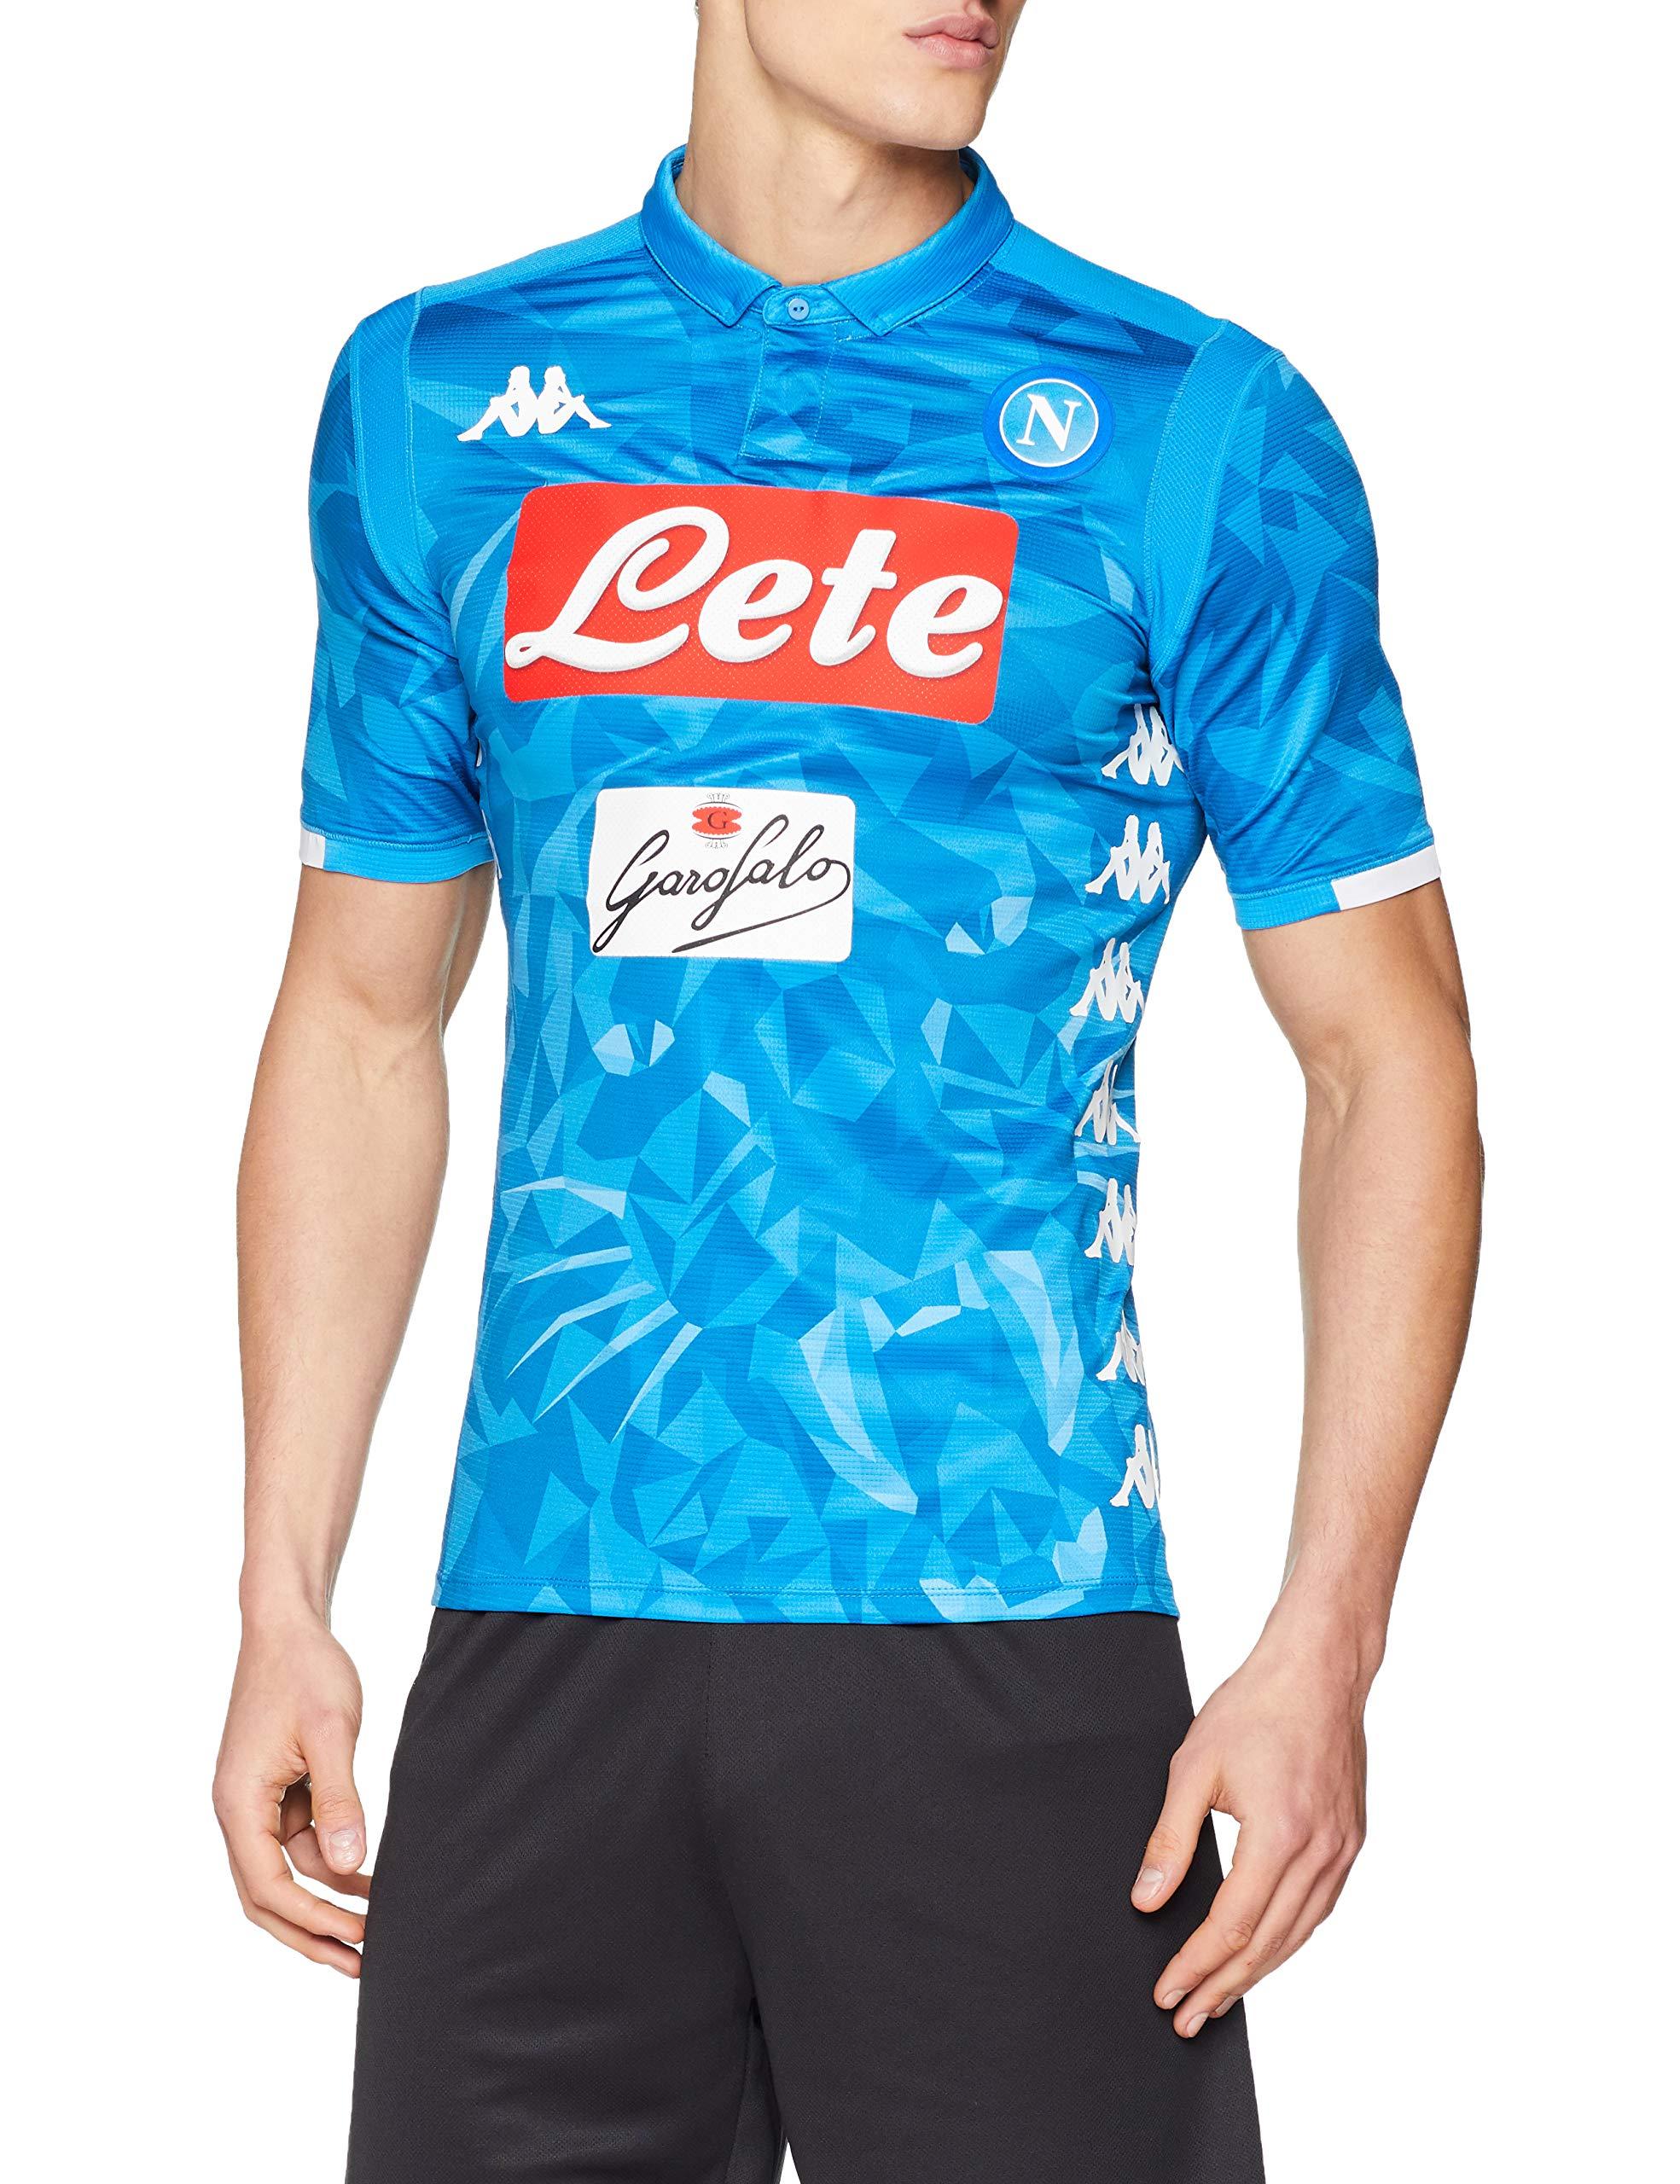 Ssc Napoli Home Match Shirt 2018 2019 Man Buy Online In Bosnia And Herzegovina At Bosnia Desertcart Com Productid 199124183